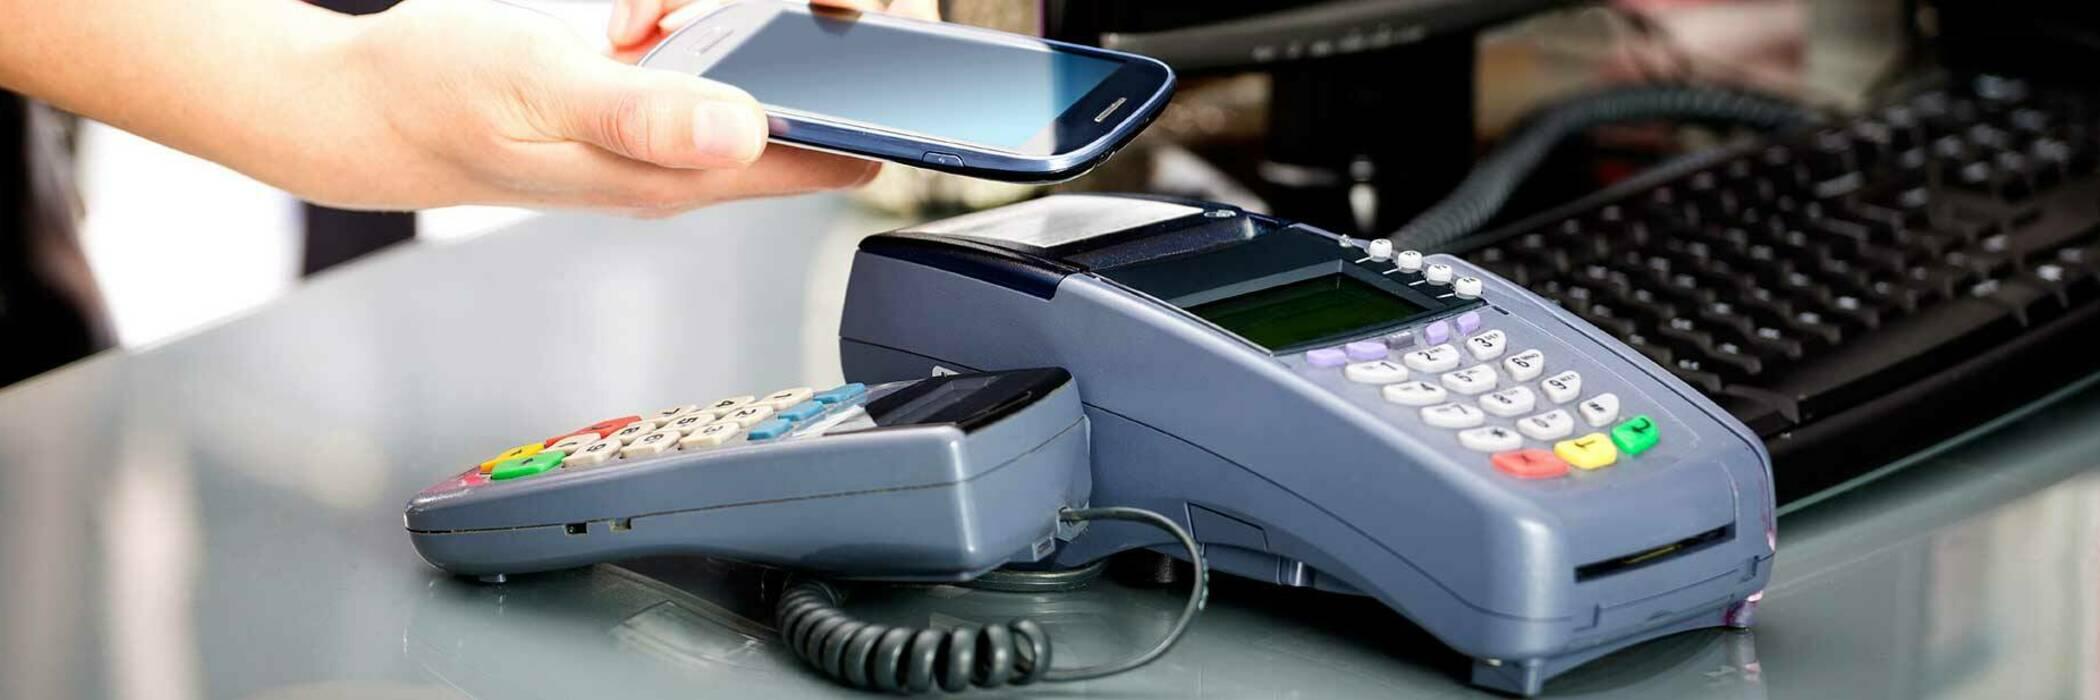 Making a payment at EFTPOS terminal.